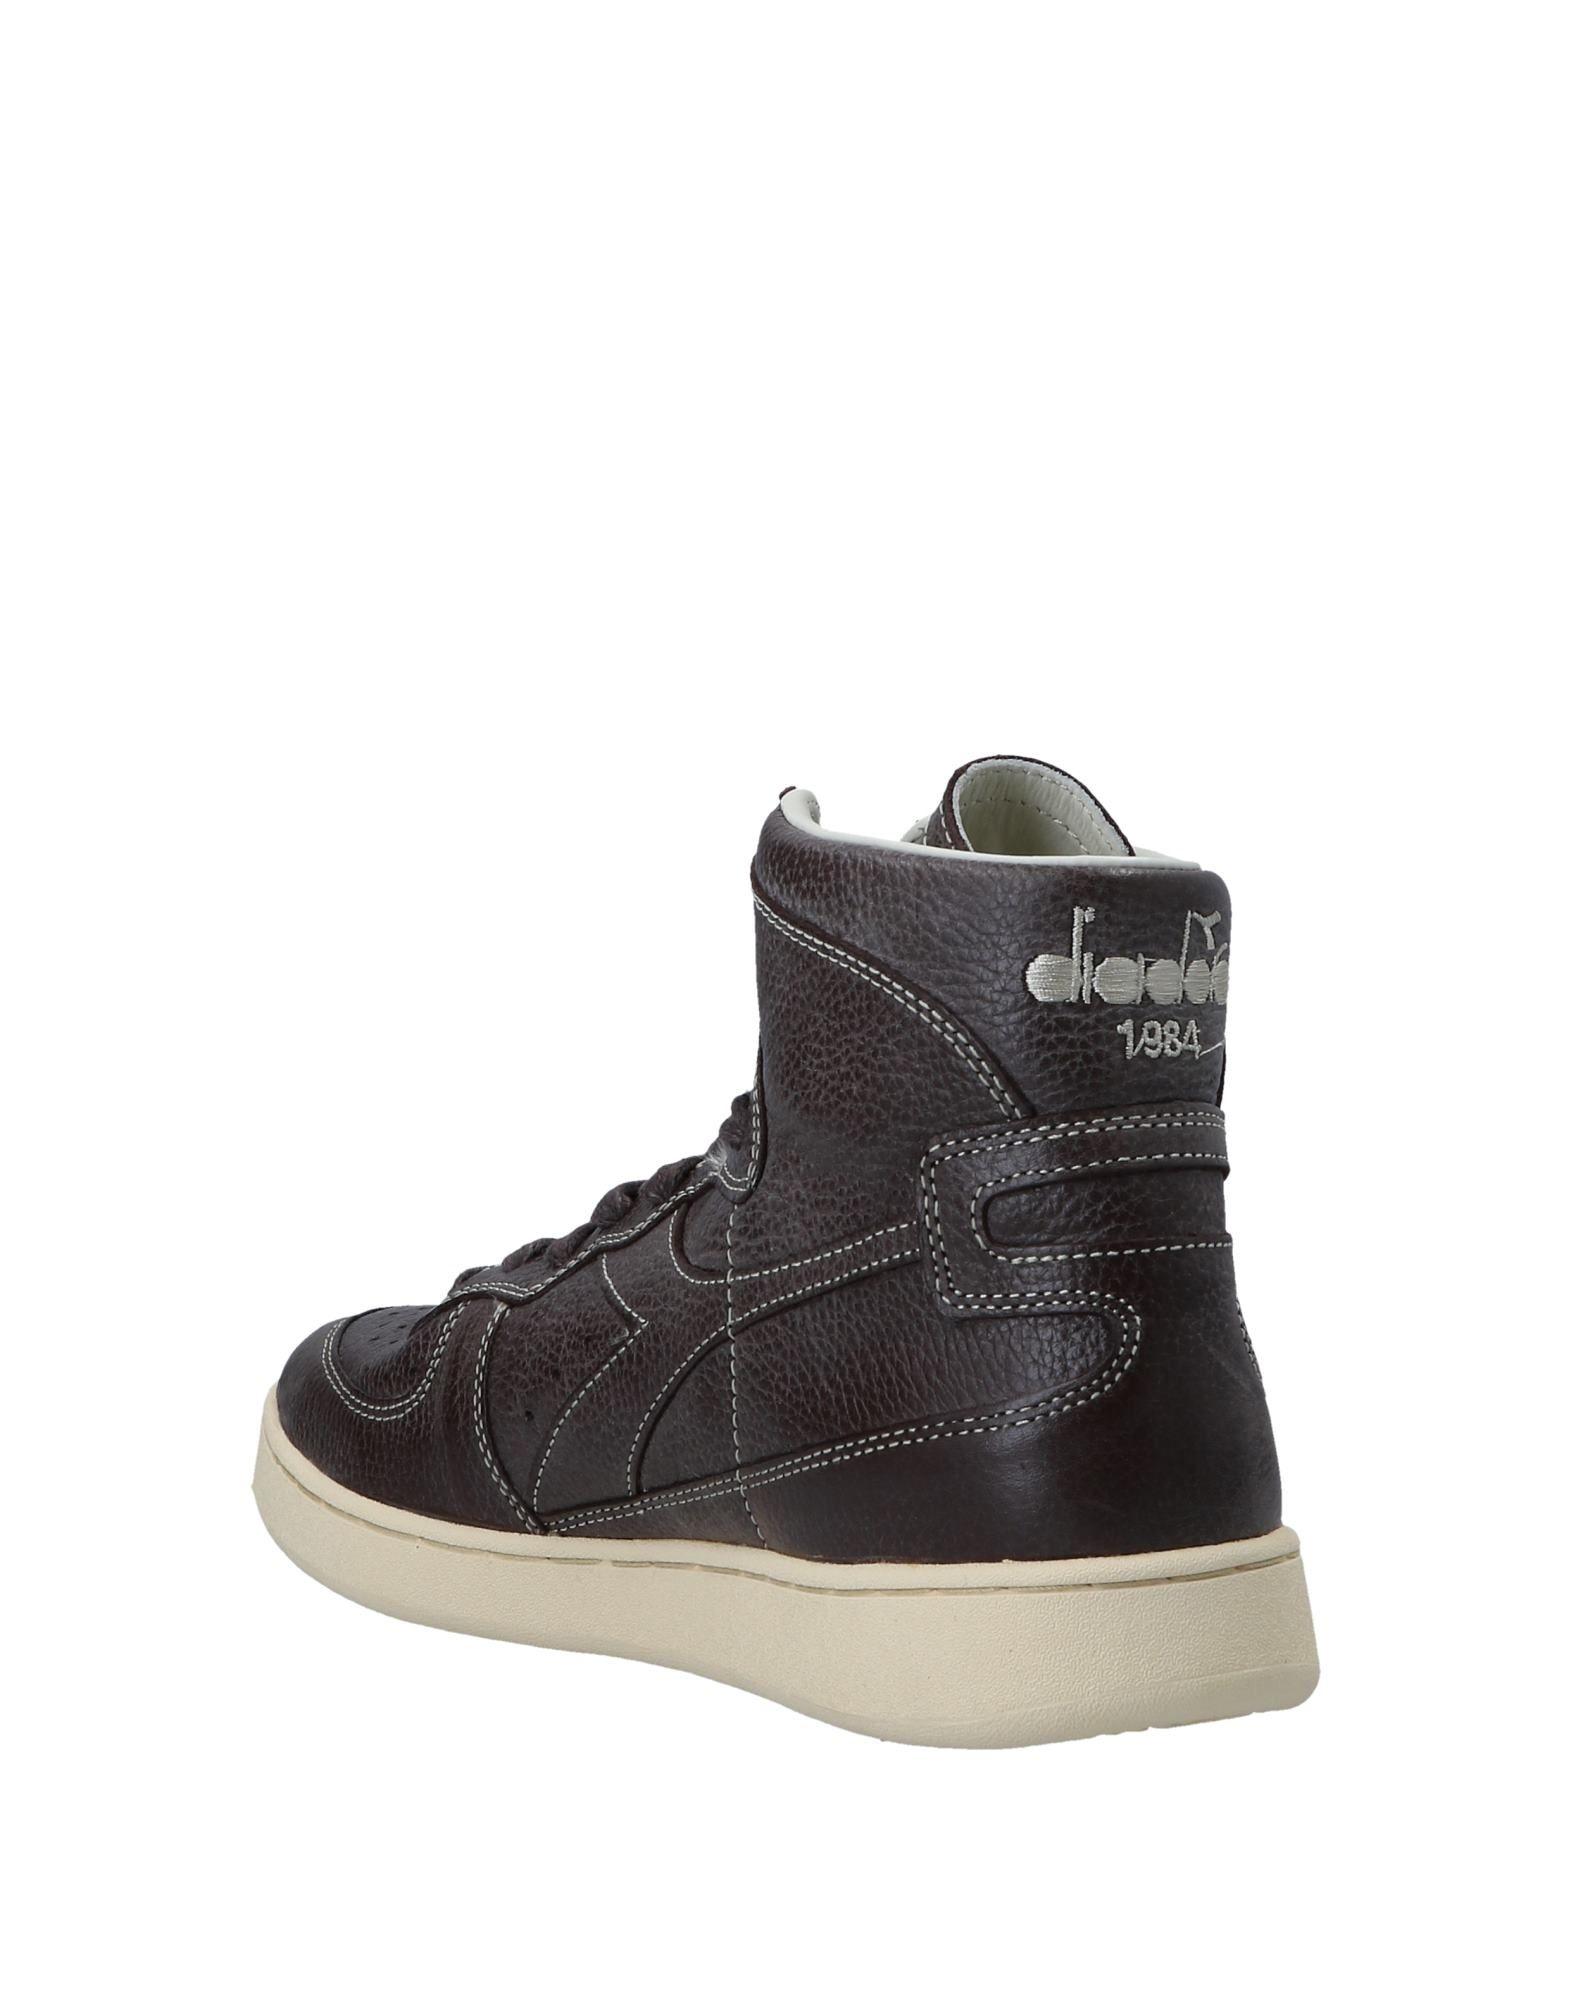 Rabatt Diadora echte Schuhe Diadora Rabatt Sneakers Herren  11556591QR 043bdc